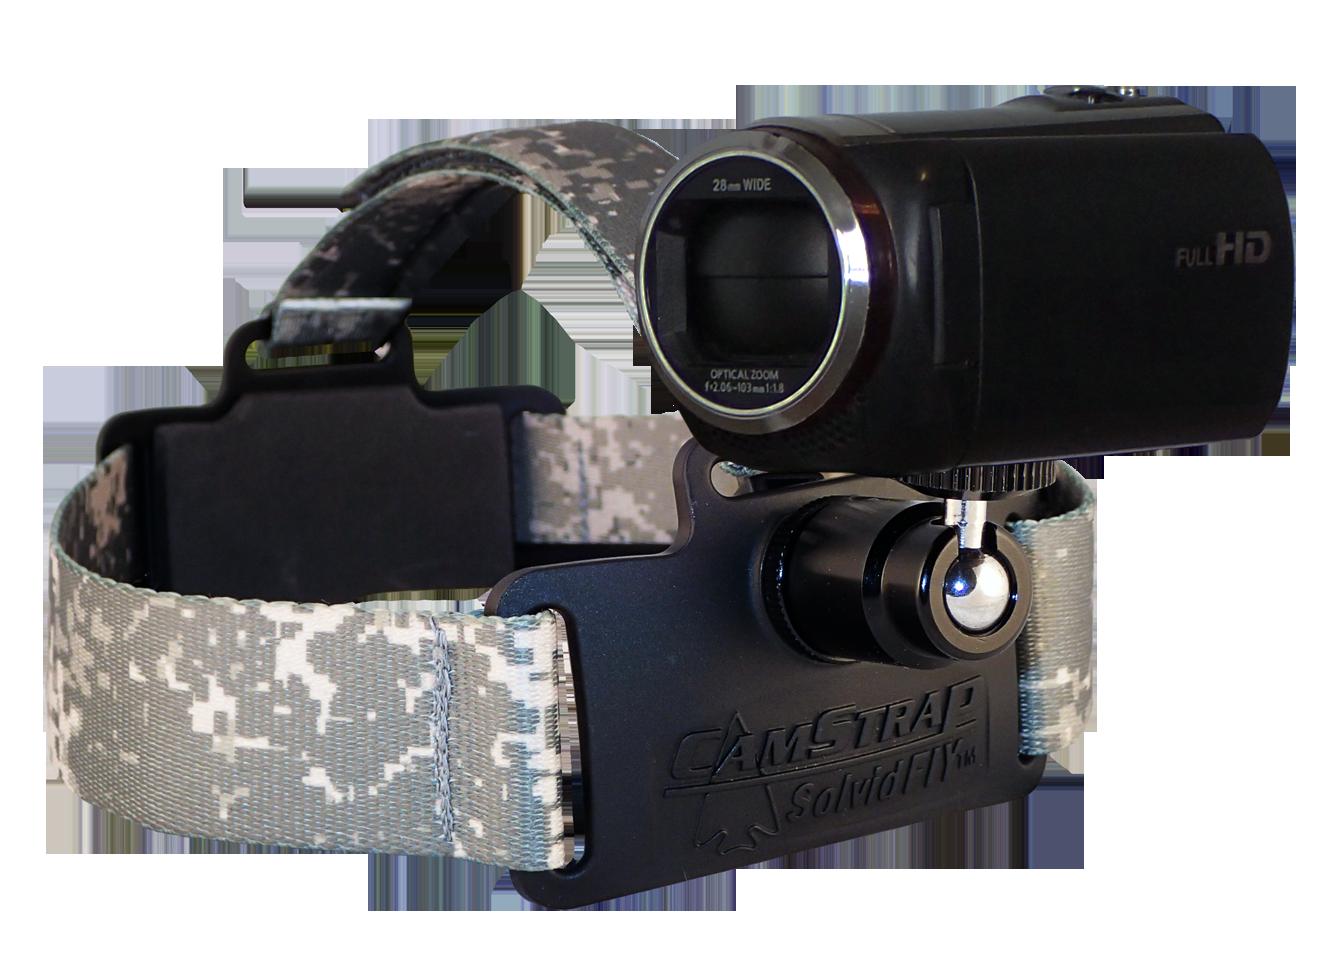 fd19c013649 Solvid CamStrap Universal Head Cam Mount